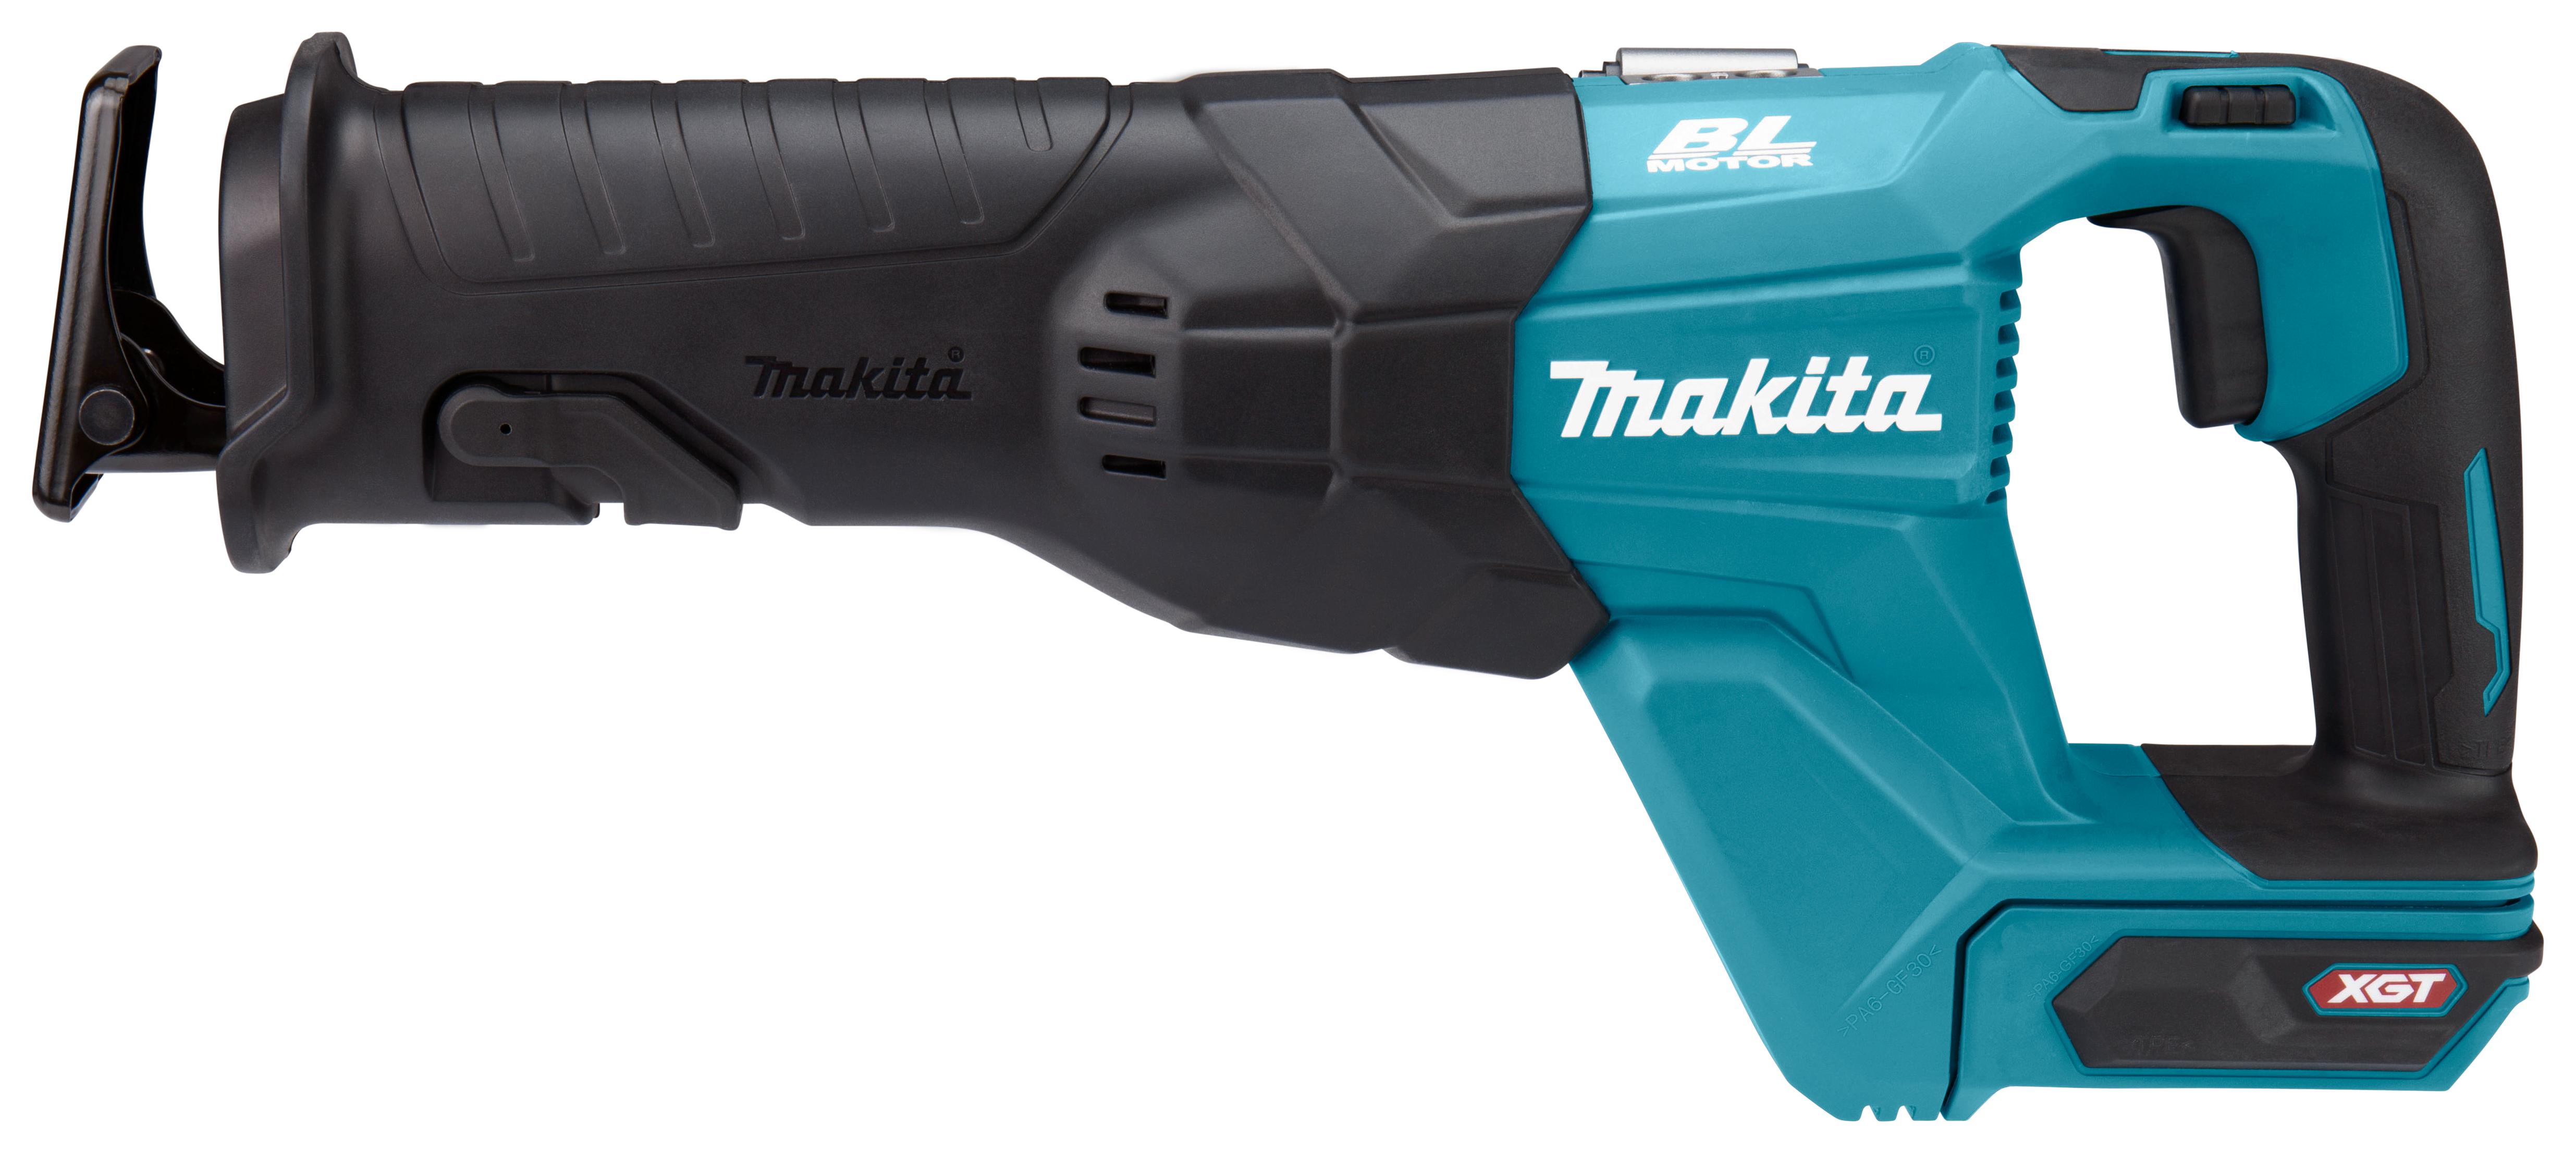 Makita JR001GZ 40 V Max Reciprozaag | Mtools